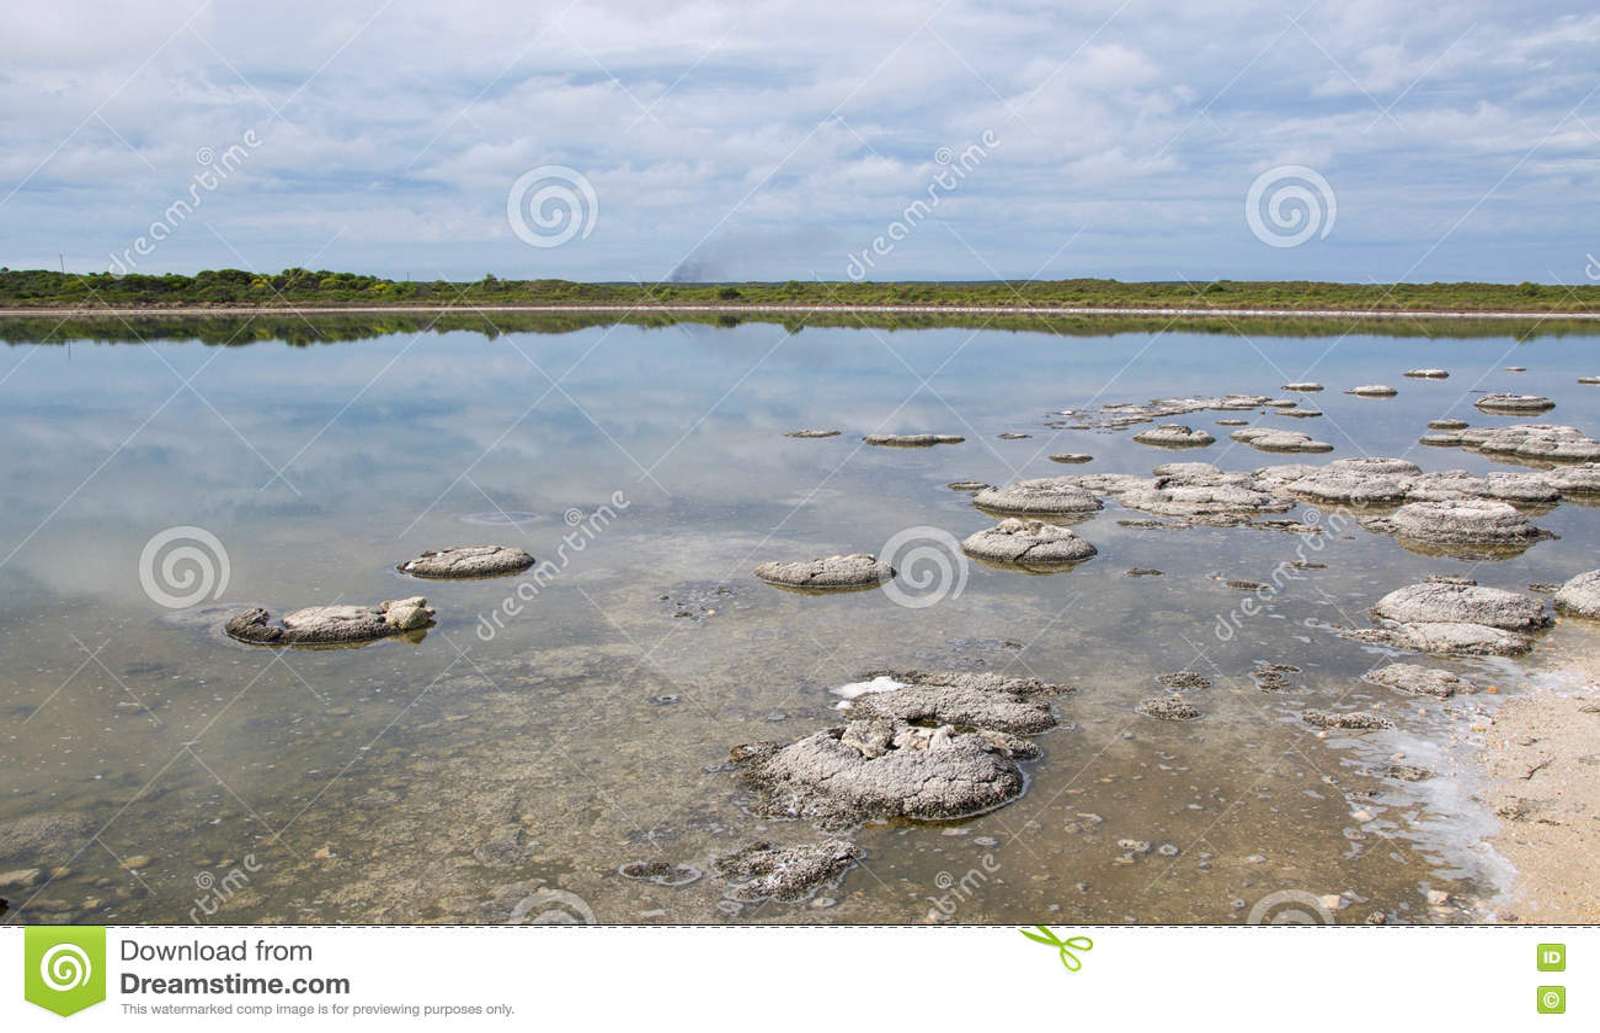 Marine Fossils In Lake Thetis Stock Image | CartoonDealer ...